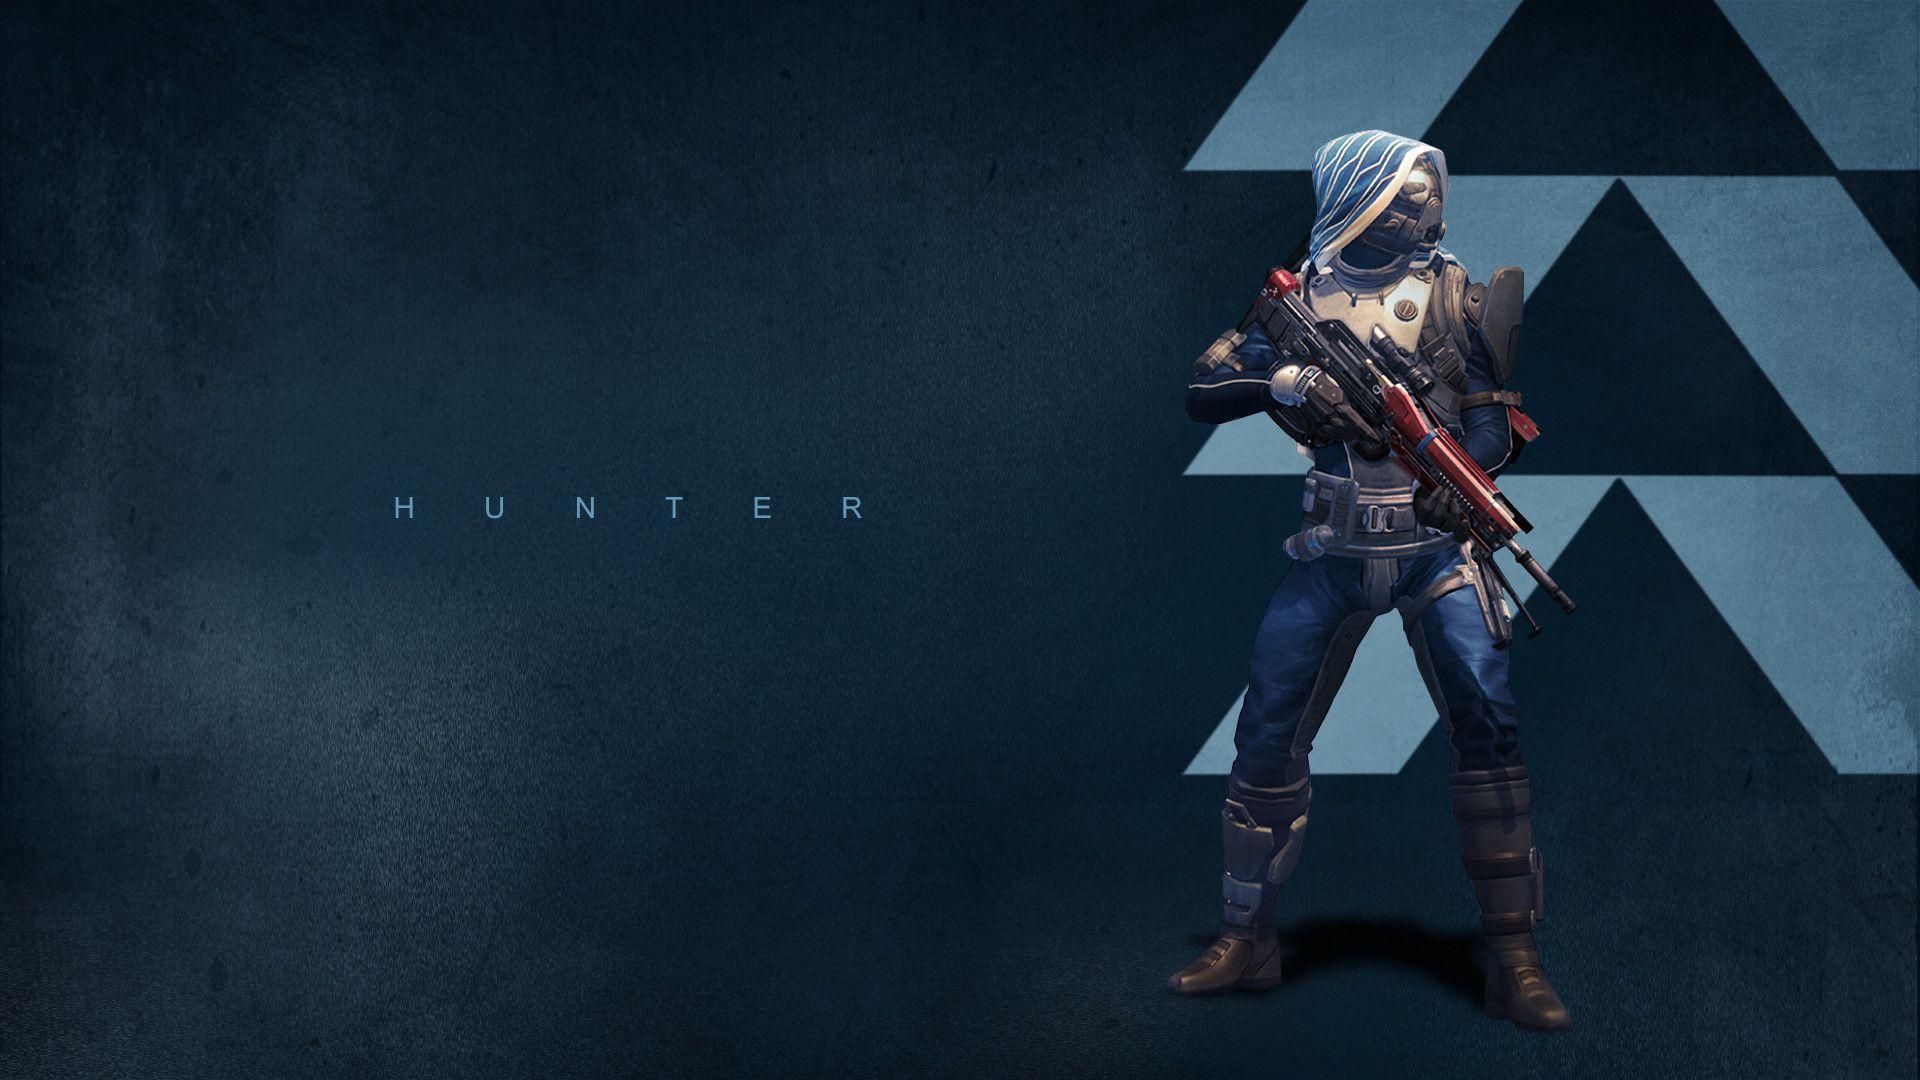 Destiny 2 Hunter Wallpapers - Top Free Destiny 2 Hunter ...